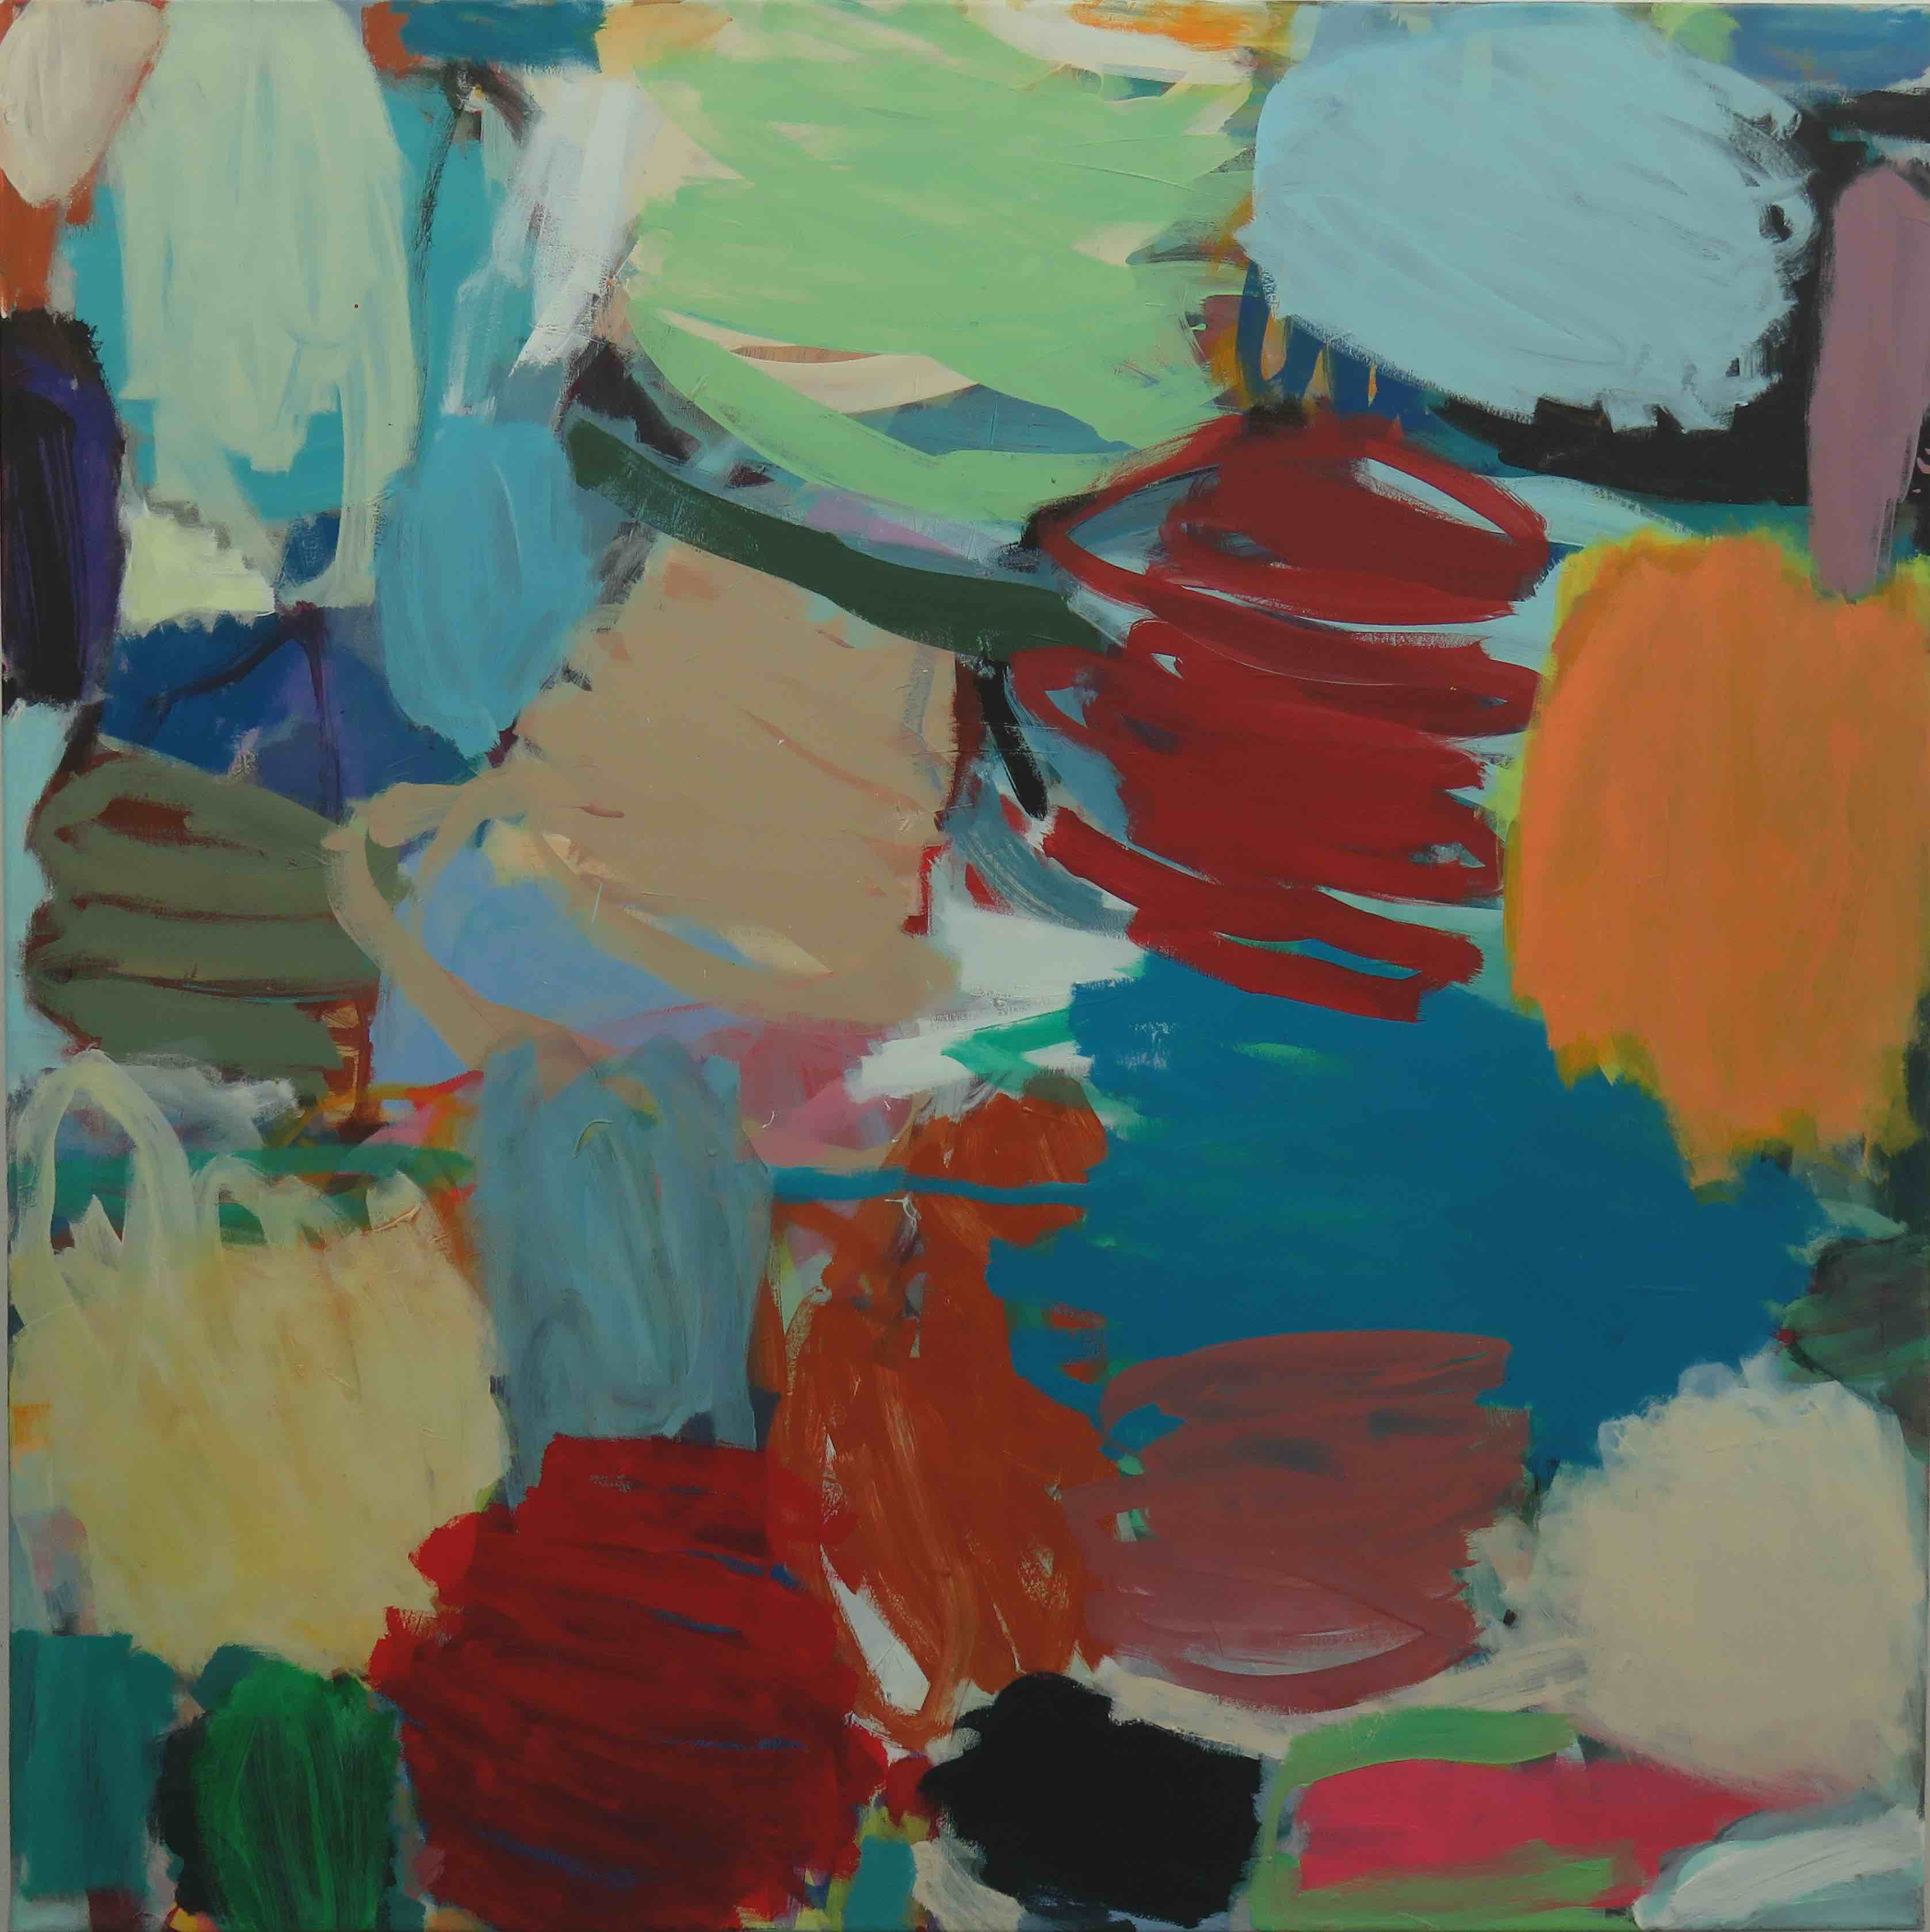 21_2012 Acryl auf Lwd 60x190cm